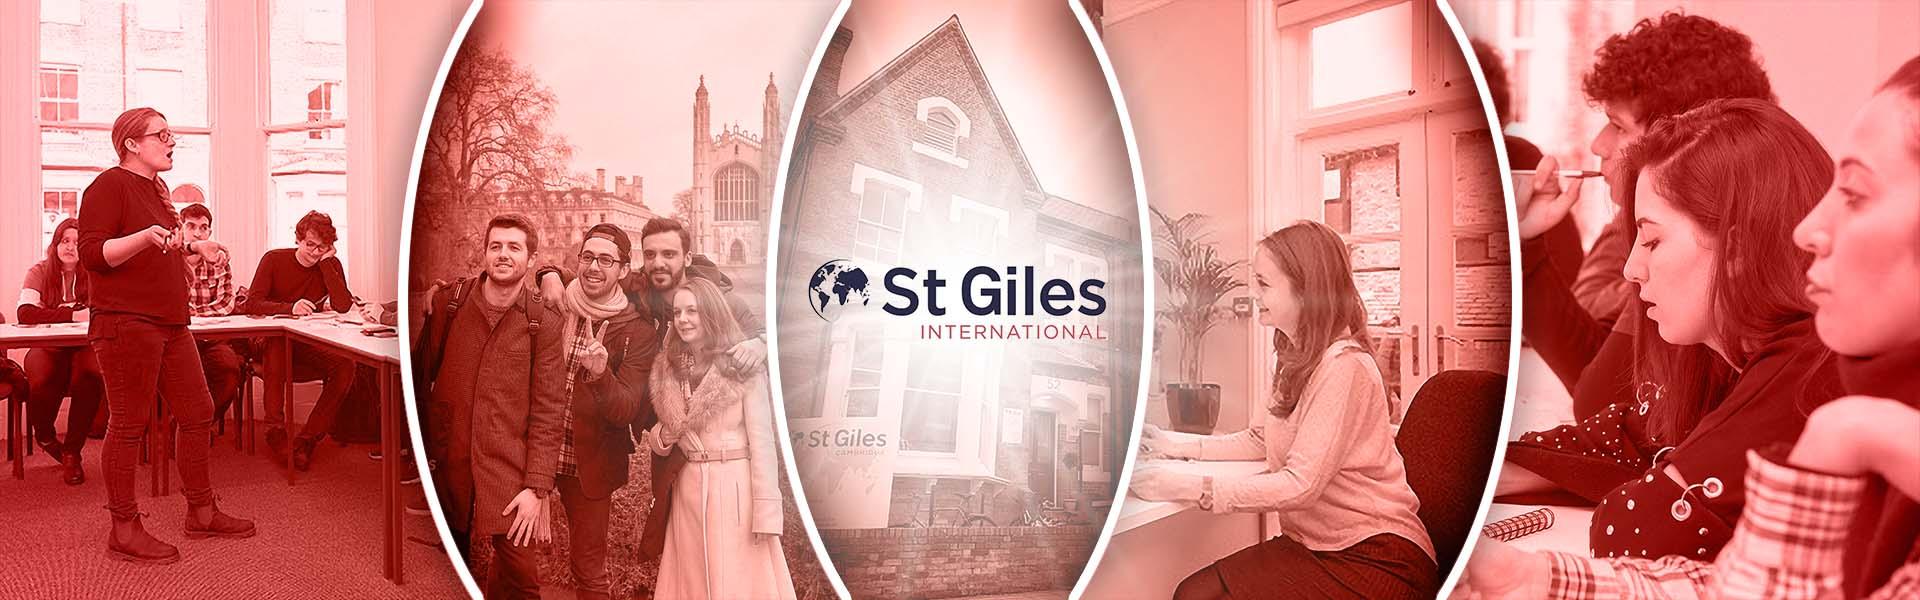 St Giles Cambridge Dil Okulu